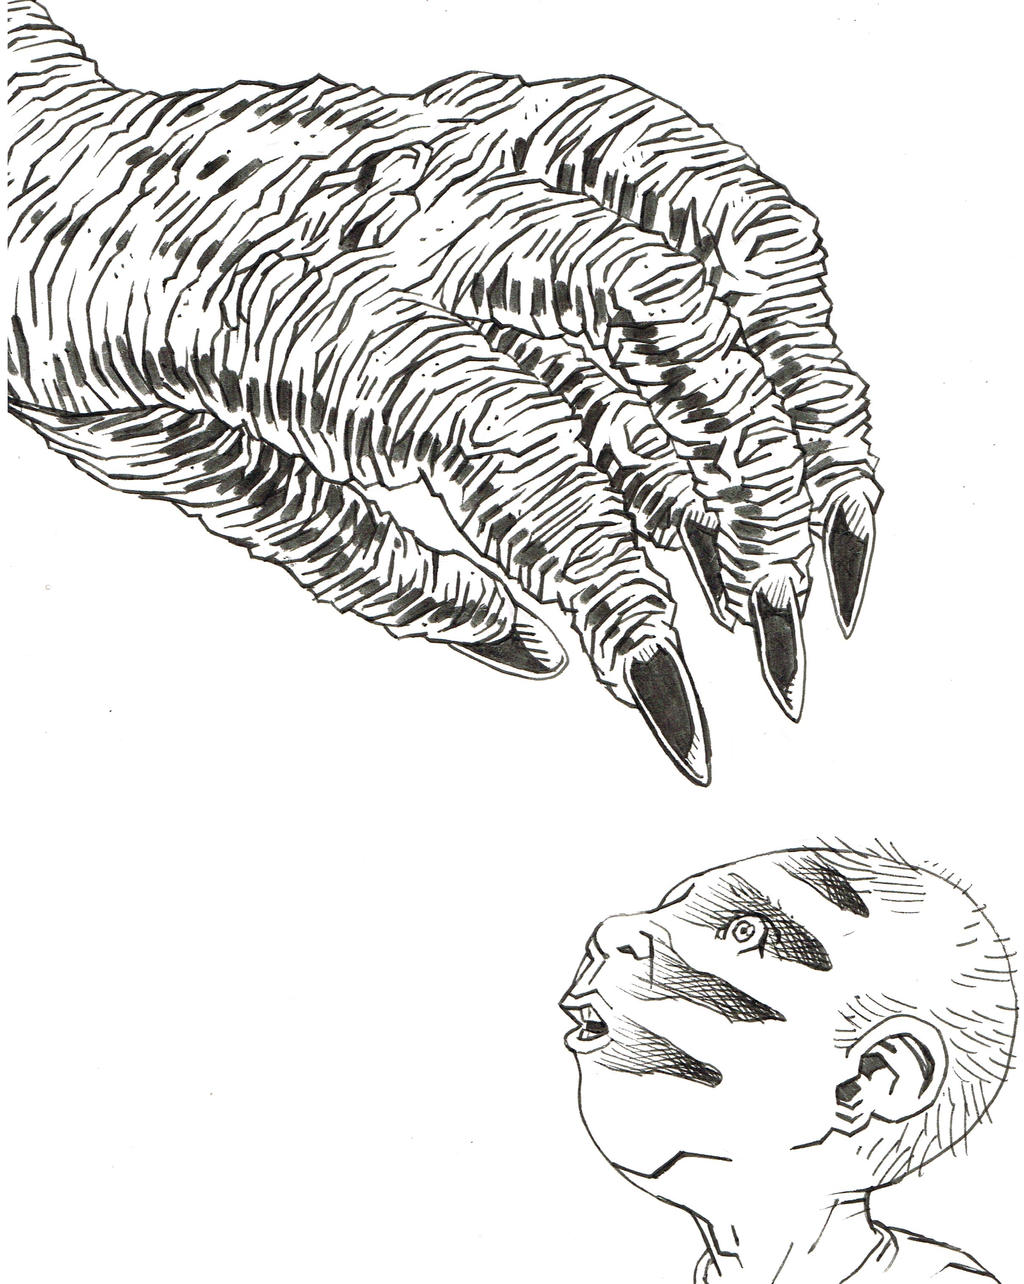 Inktober 2016 - Monster's Shadow by KurtBelcher1